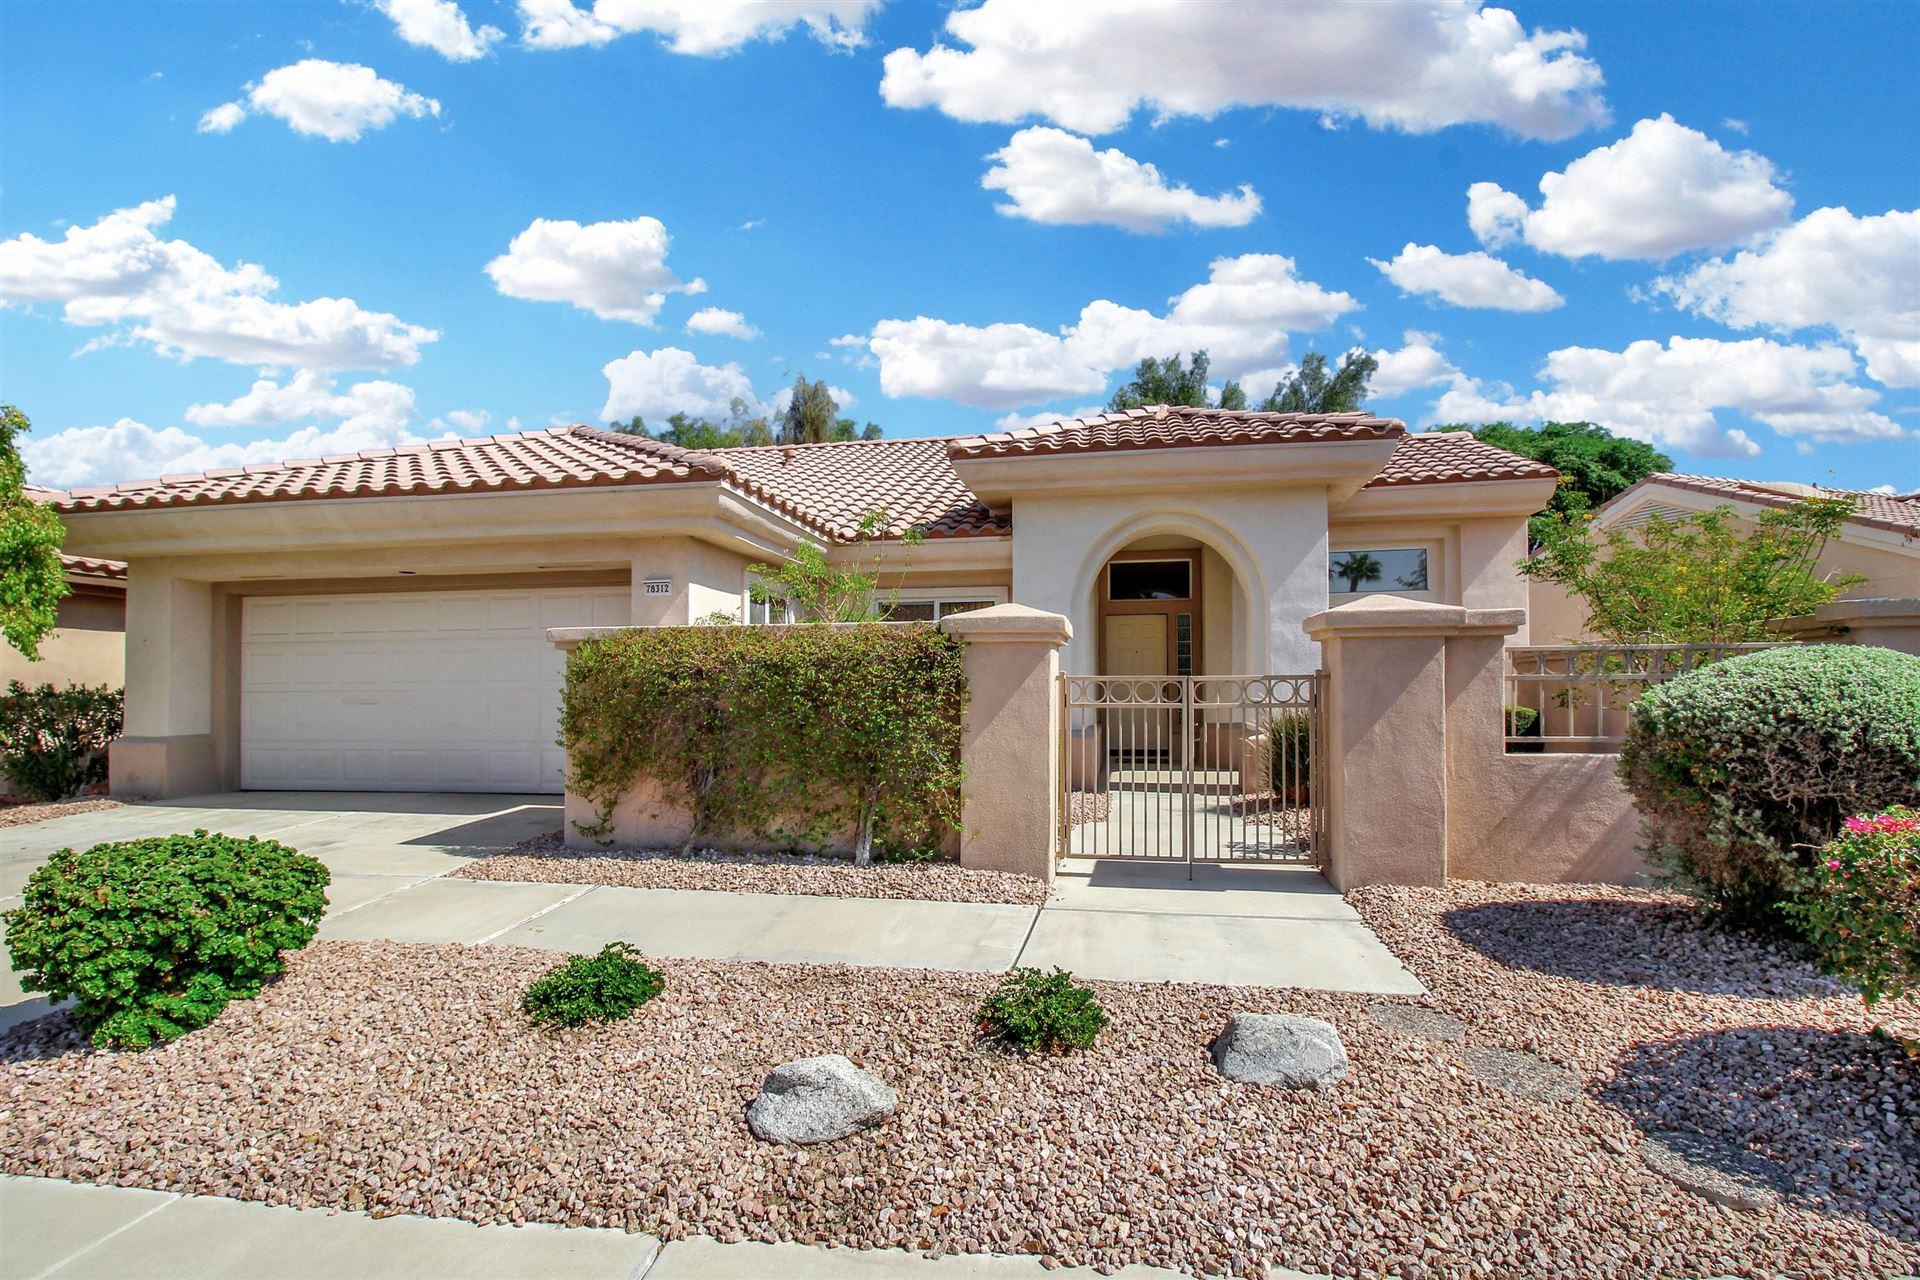 78312 Silver Sage Drive, Palm Desert, CA 92211 - #: 219049223